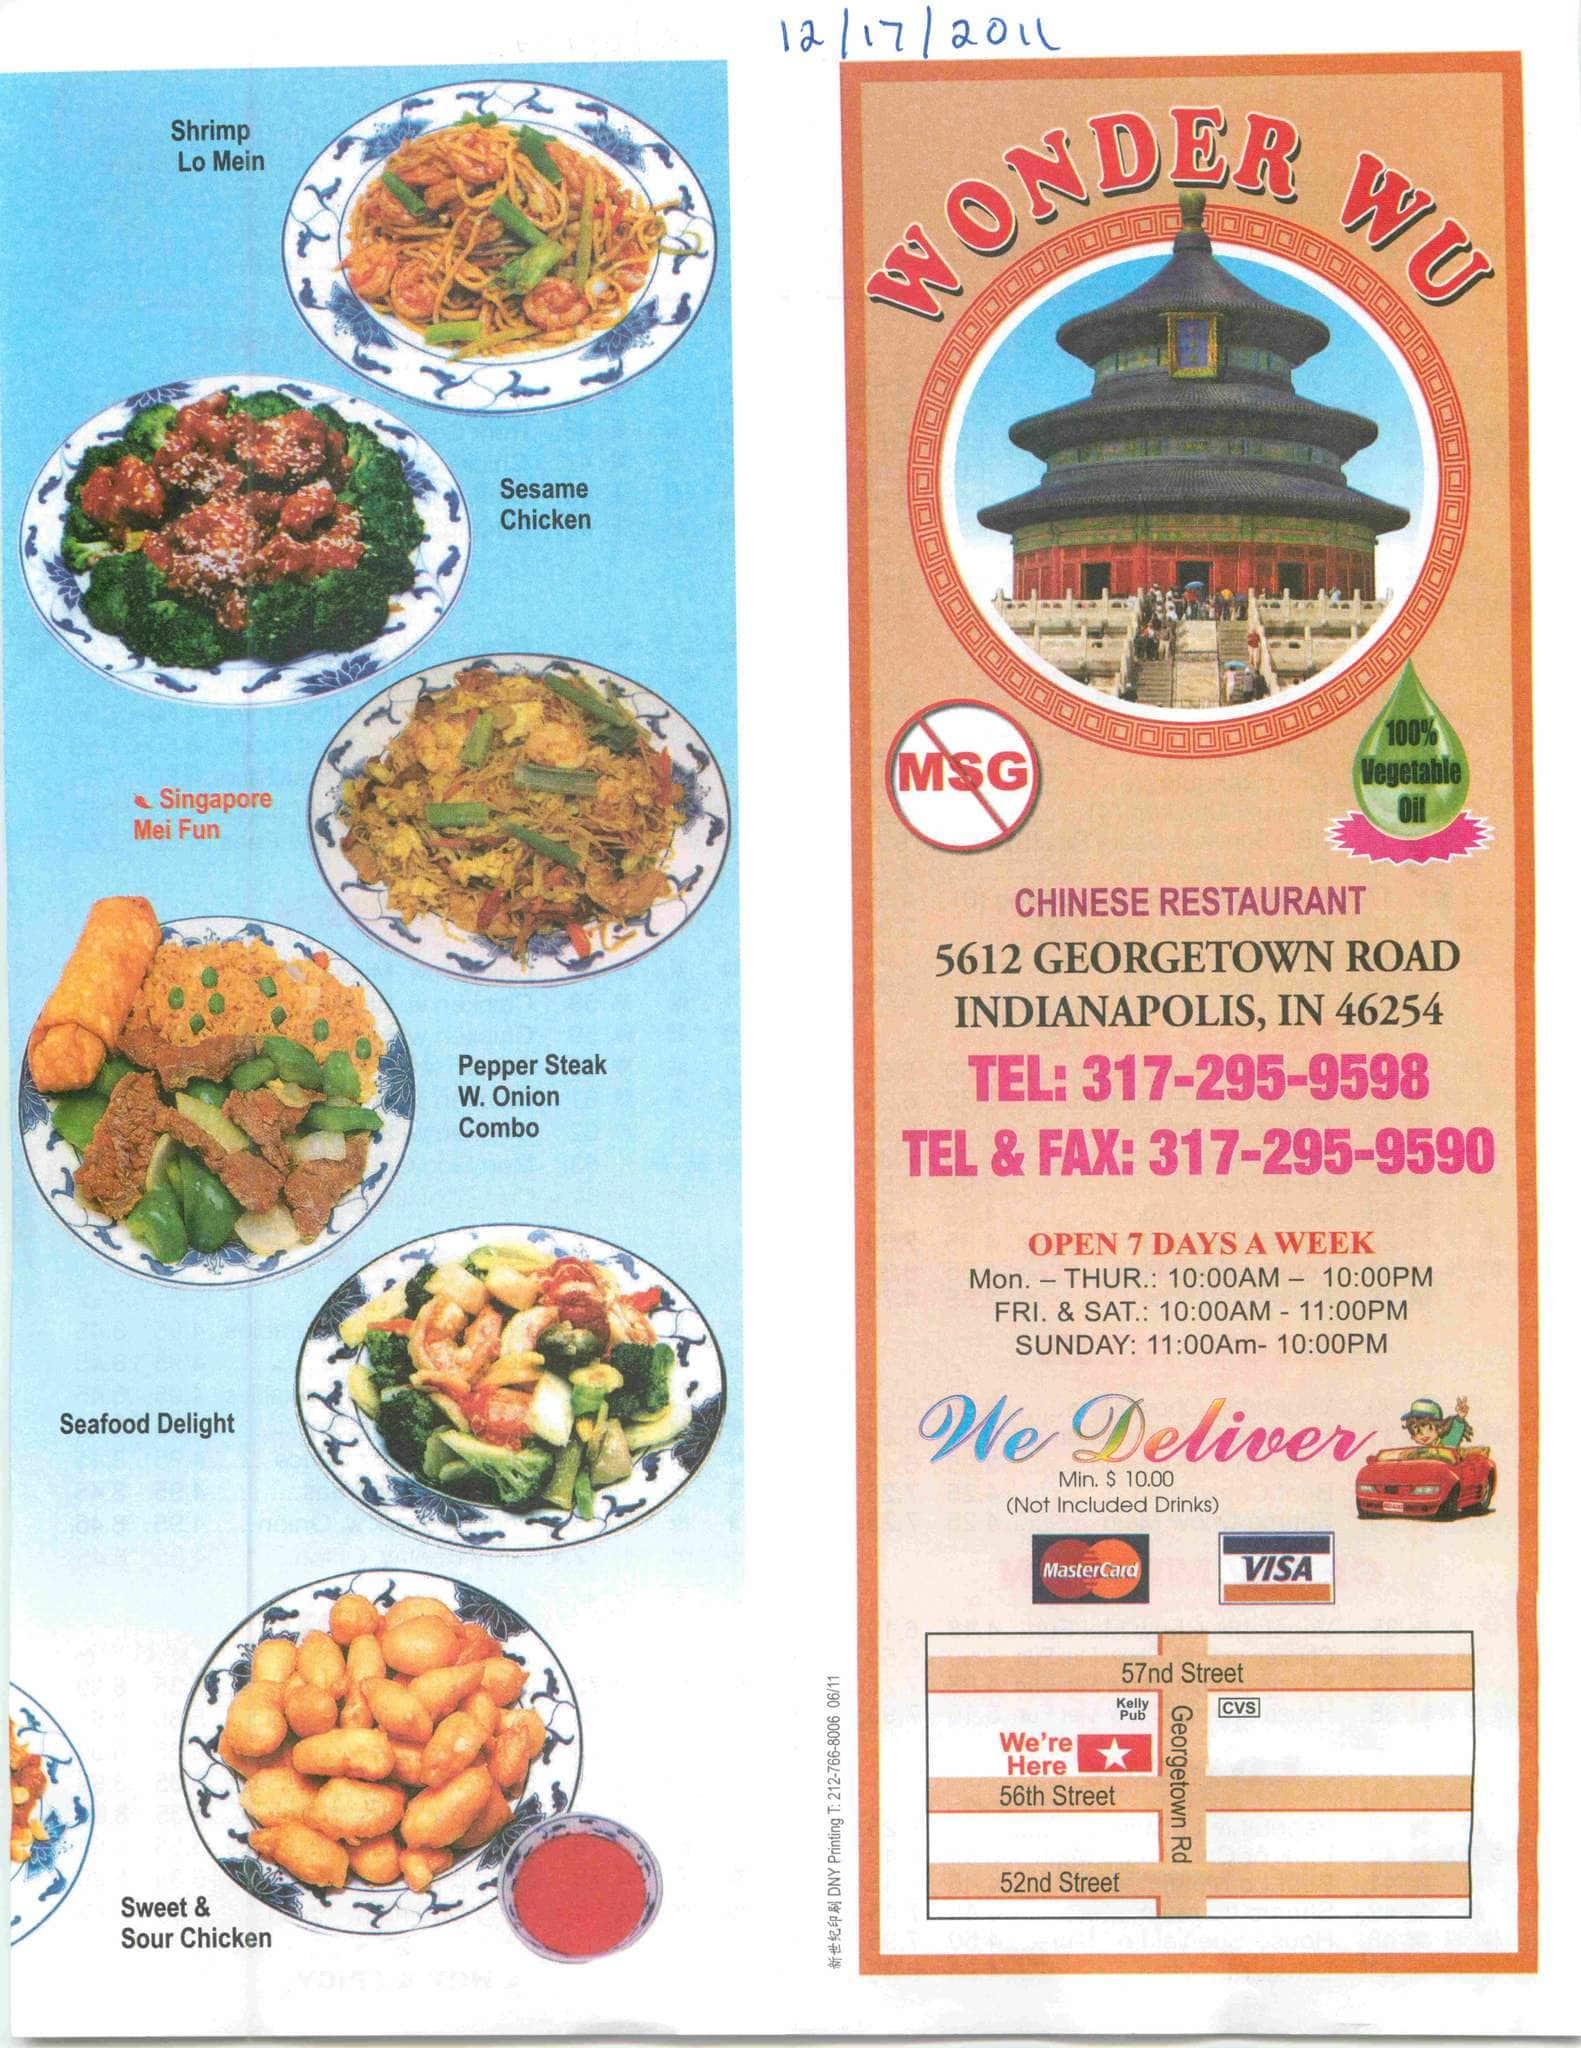 Wonder Wu Chinese Restaurant Menu - Urbanspoon/Zomato